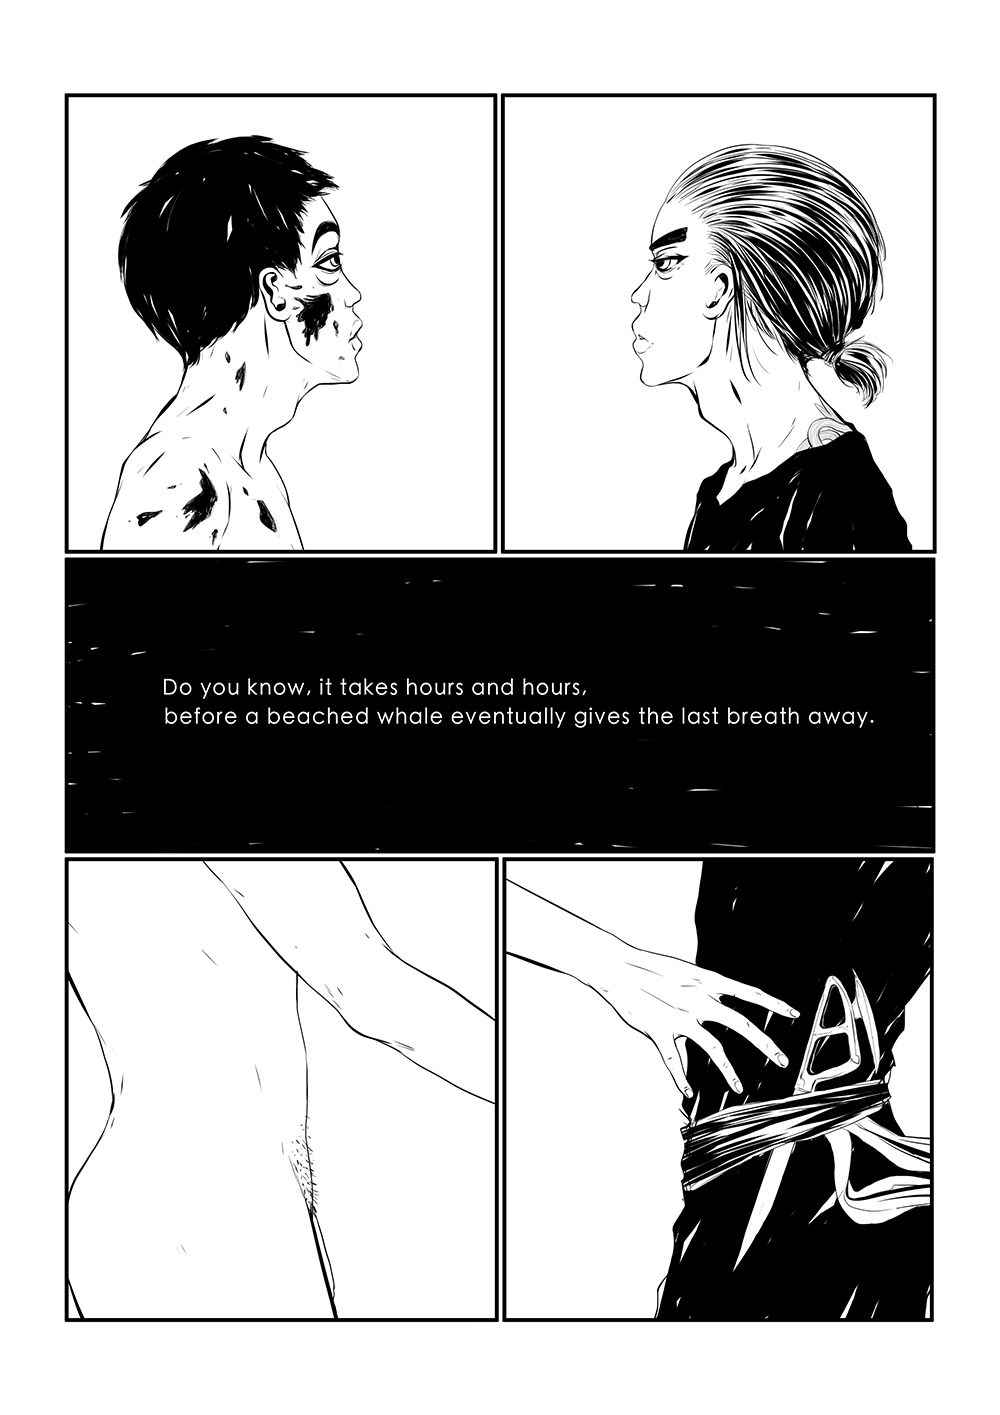 mojowang_illustration_betweenrivers_24_5.jpg